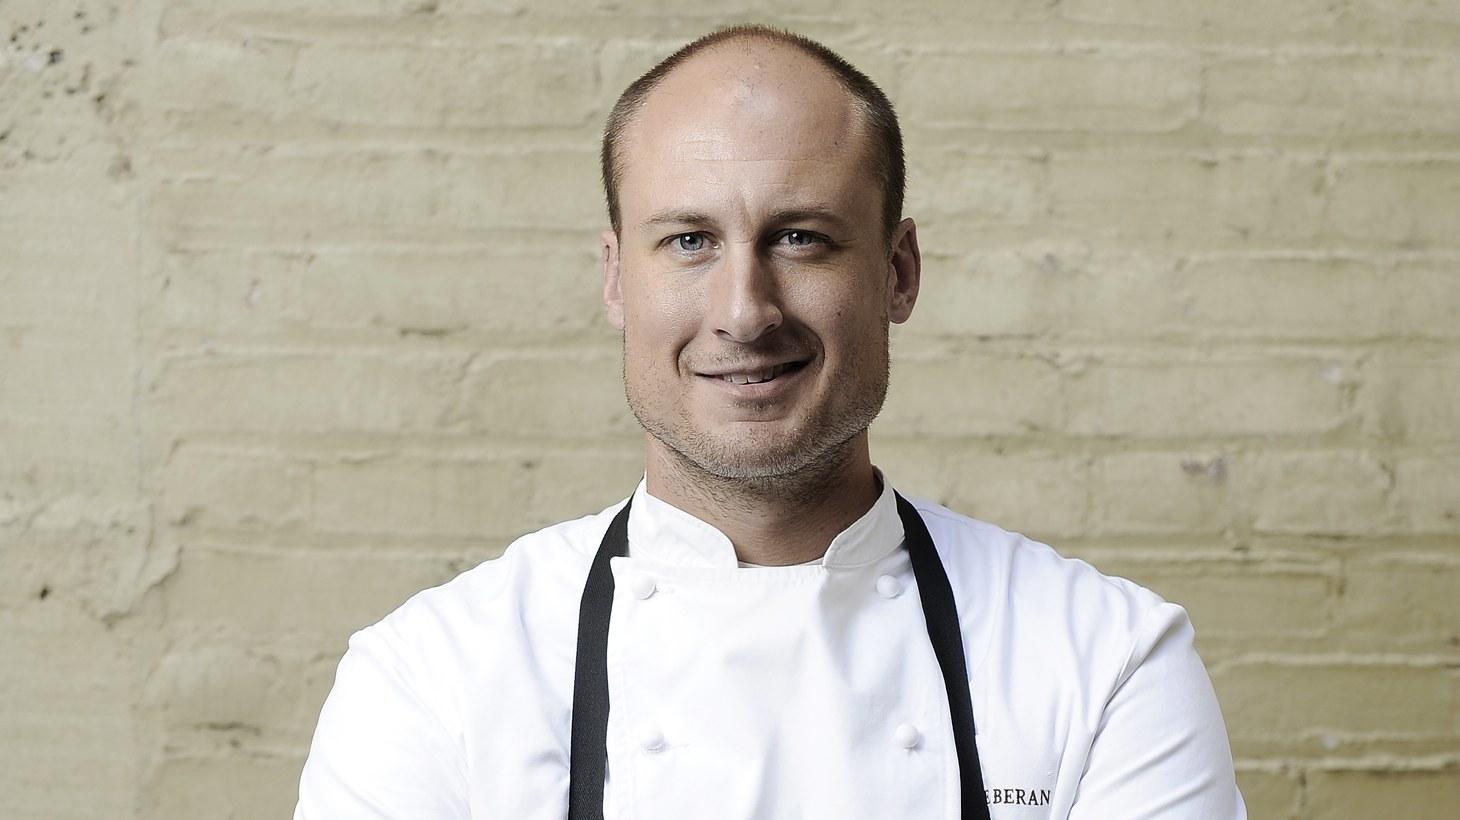 Chef Dave Beran